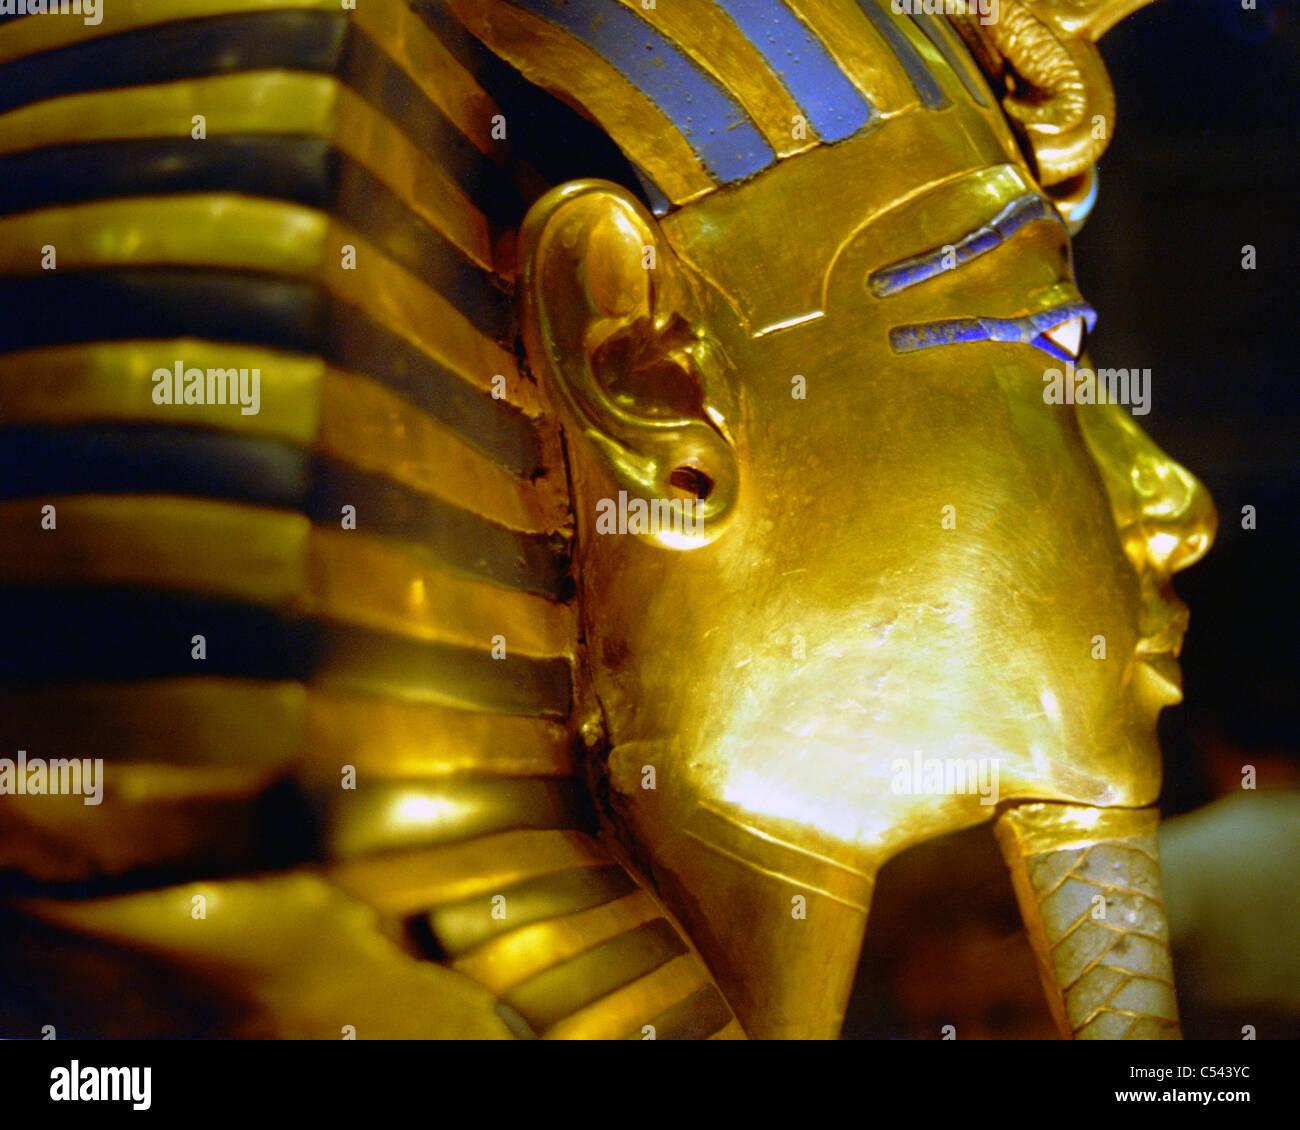 Mask of King Tut (Tutankhamun). Profile close up view. - Stock Image